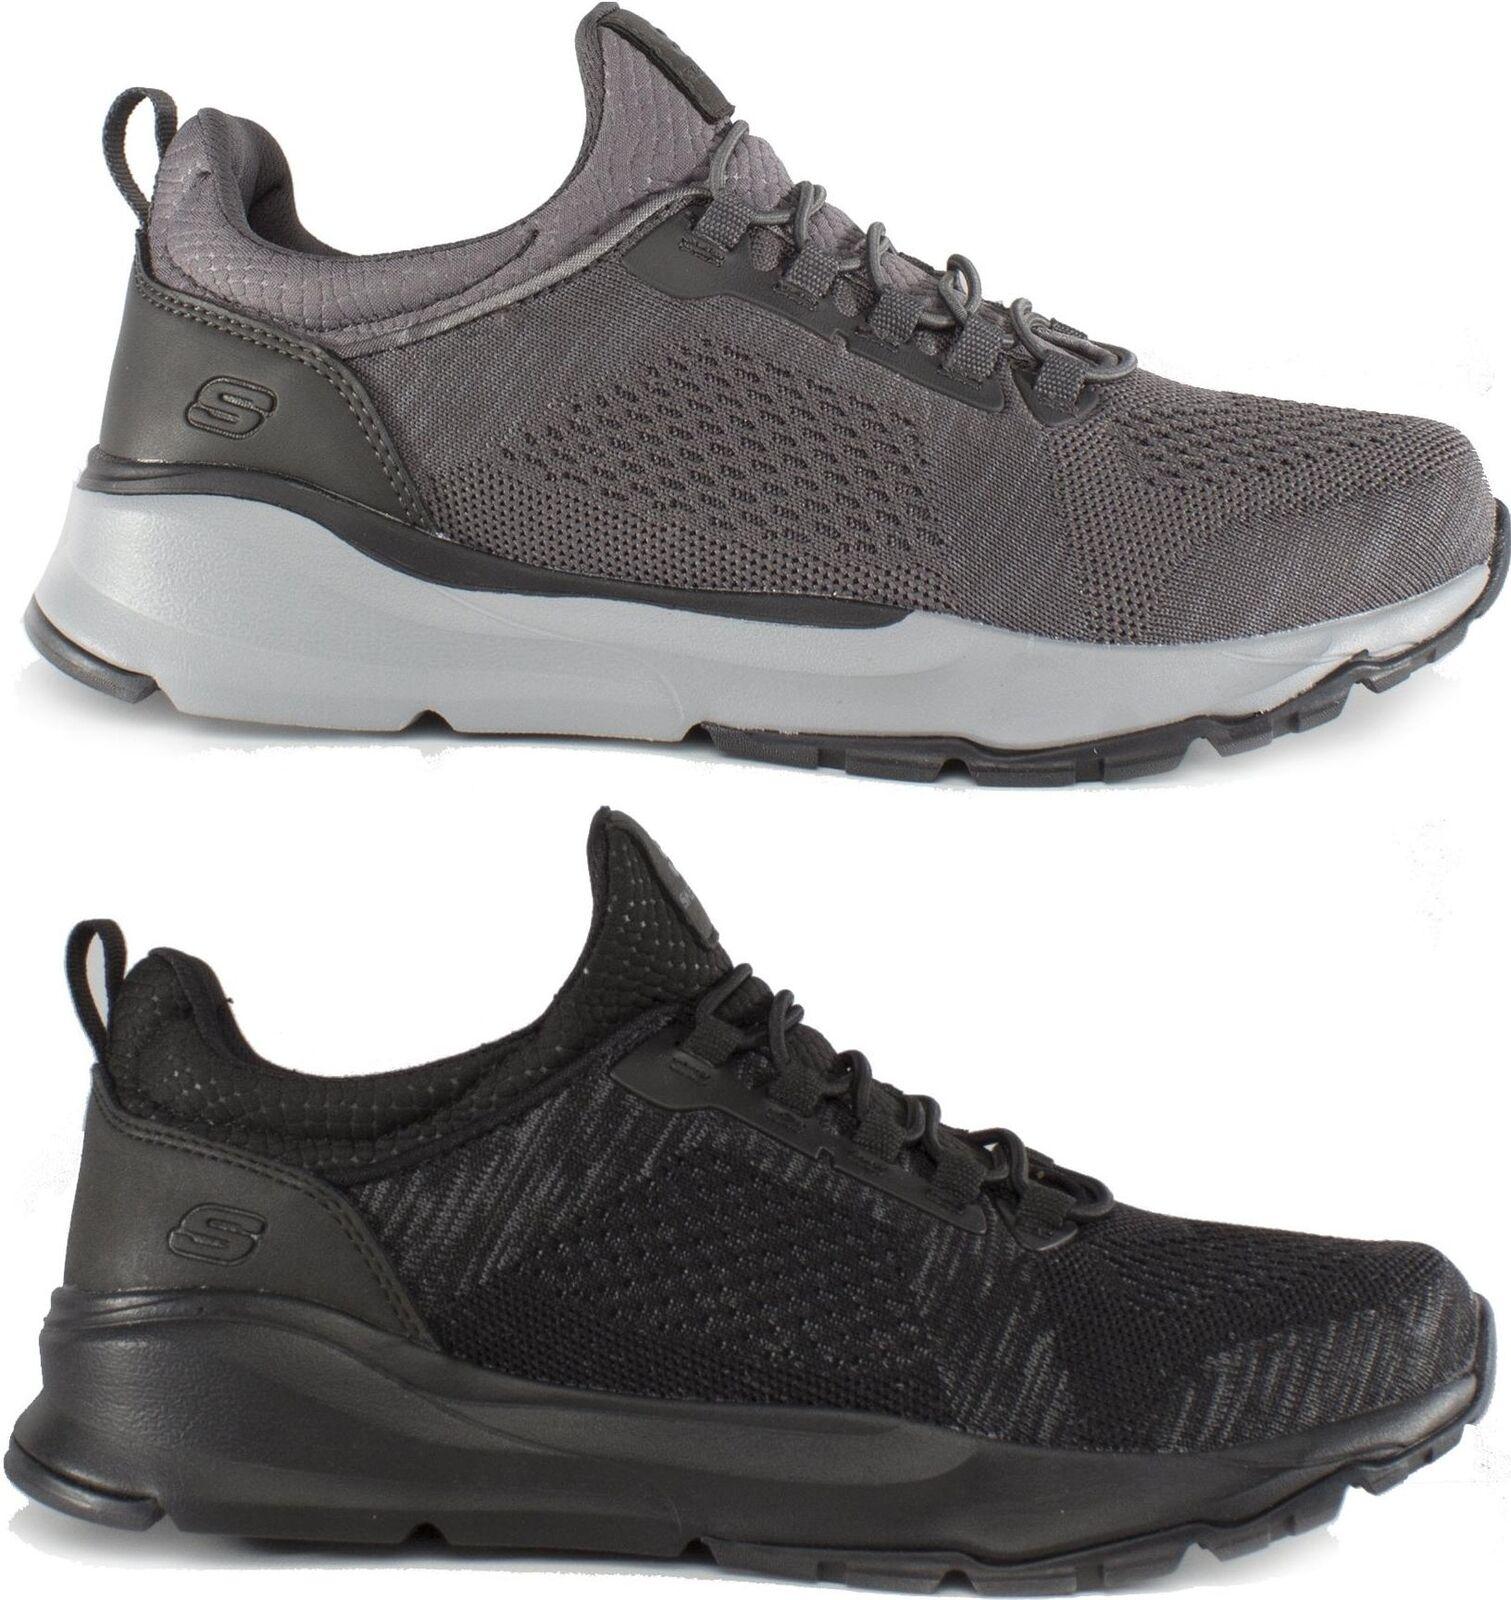 Skechers RELVEN RENTON Mens Textile Mesh Casual Lace Up Sports Trainers shoes